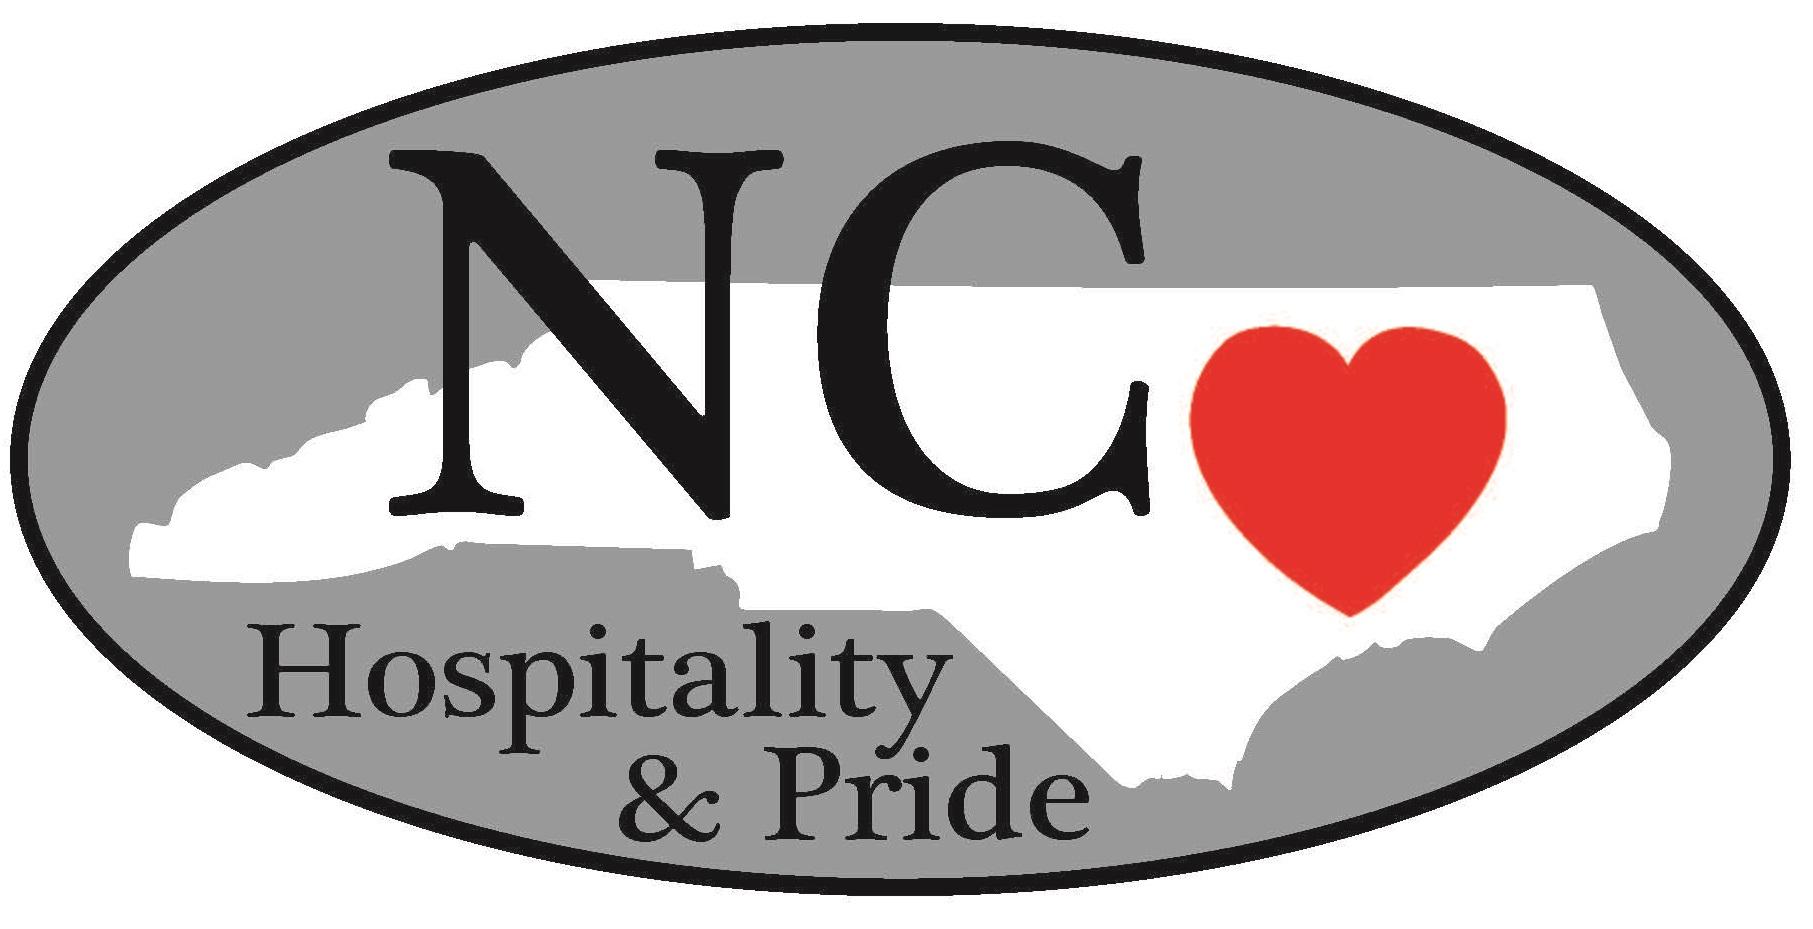 NC Hospitality and Pride logo